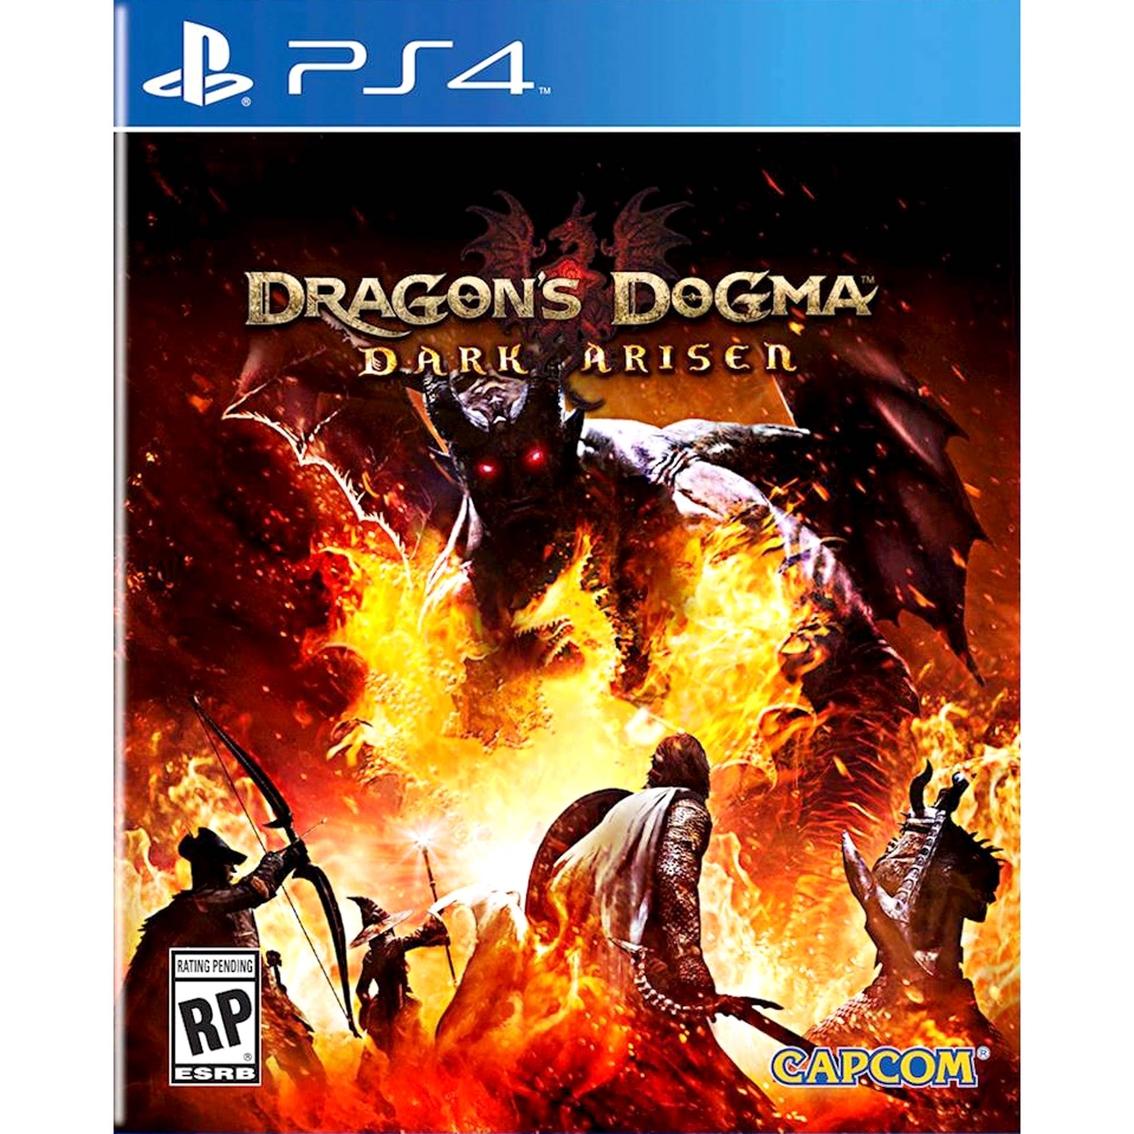 Dragon's Dogma: Dark Arisen (ps4) | Ps4 Games | Electronics | Shop